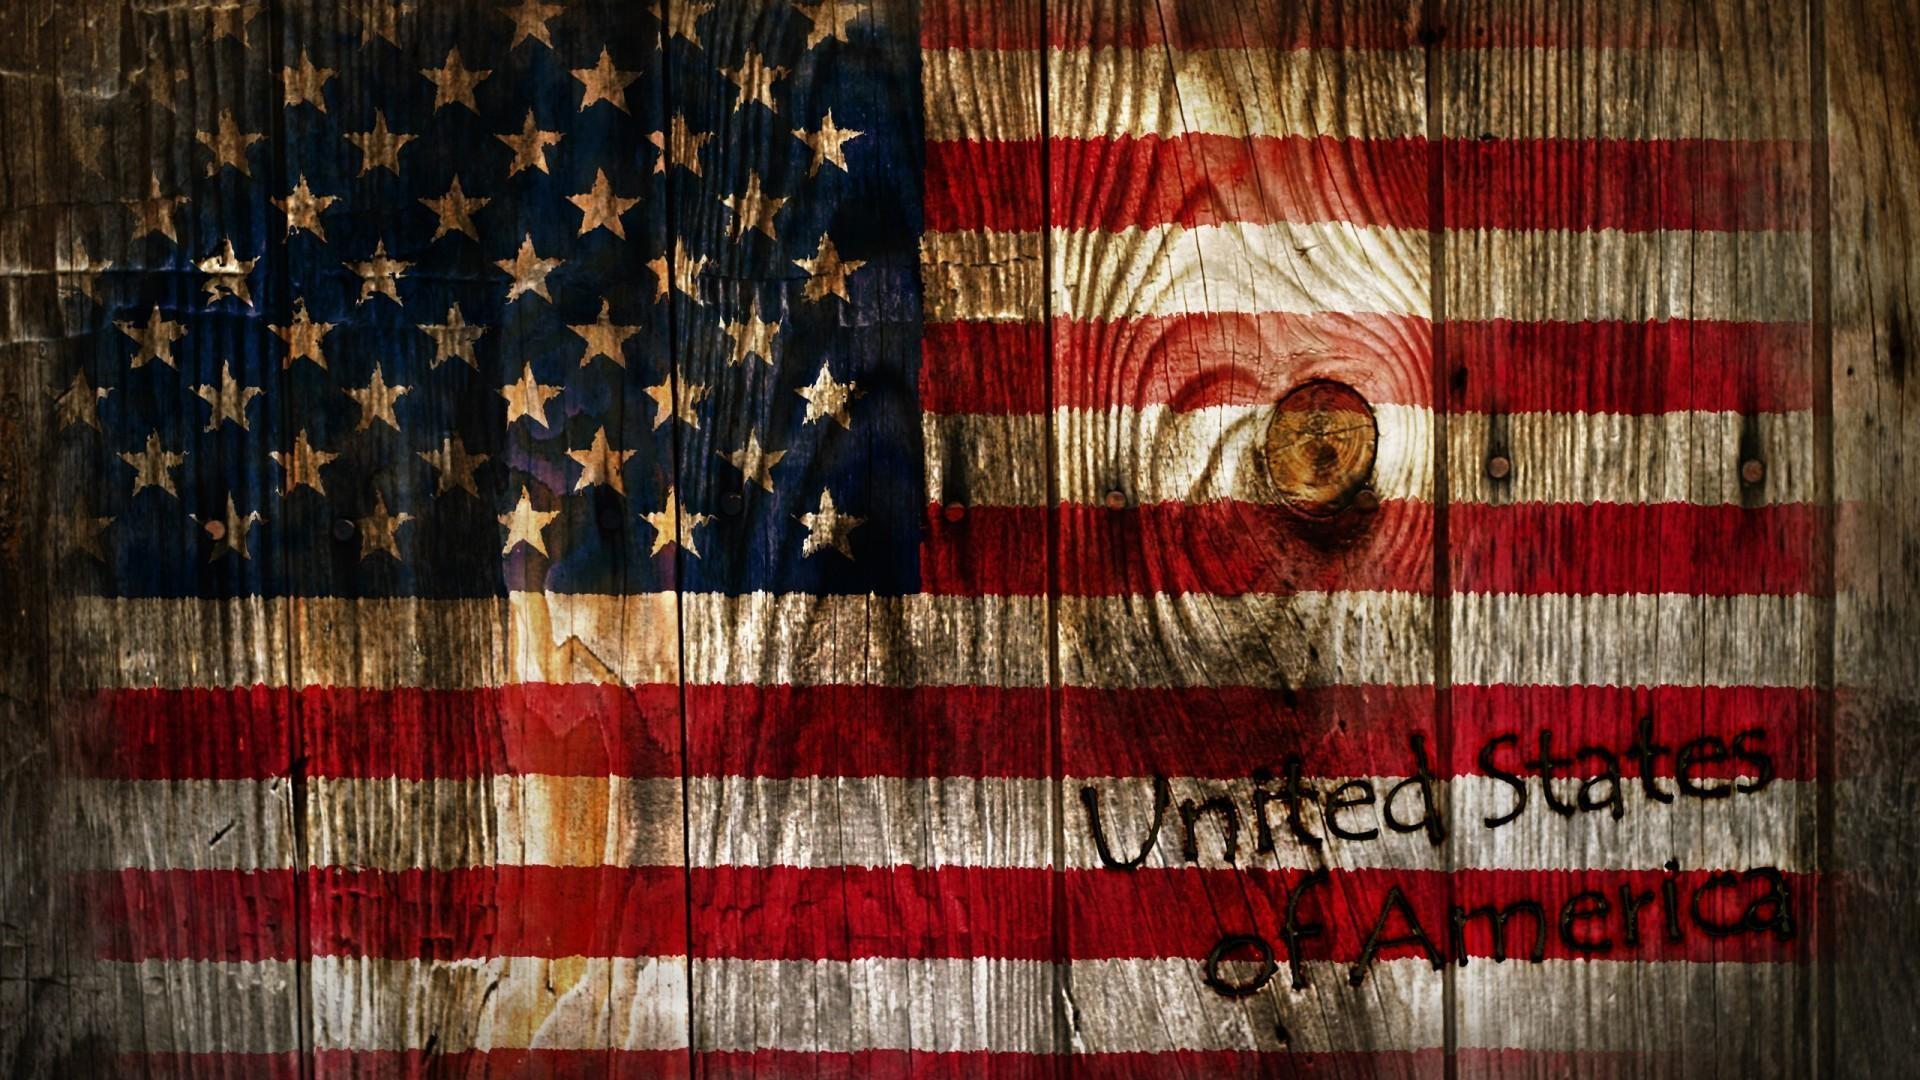 Patriotic wallpapers and screensavers 66 images 1920x1080 patriotic wallpaper free pics download for android desktop hd 1024768 patriotic wallpaper voltagebd Choice Image